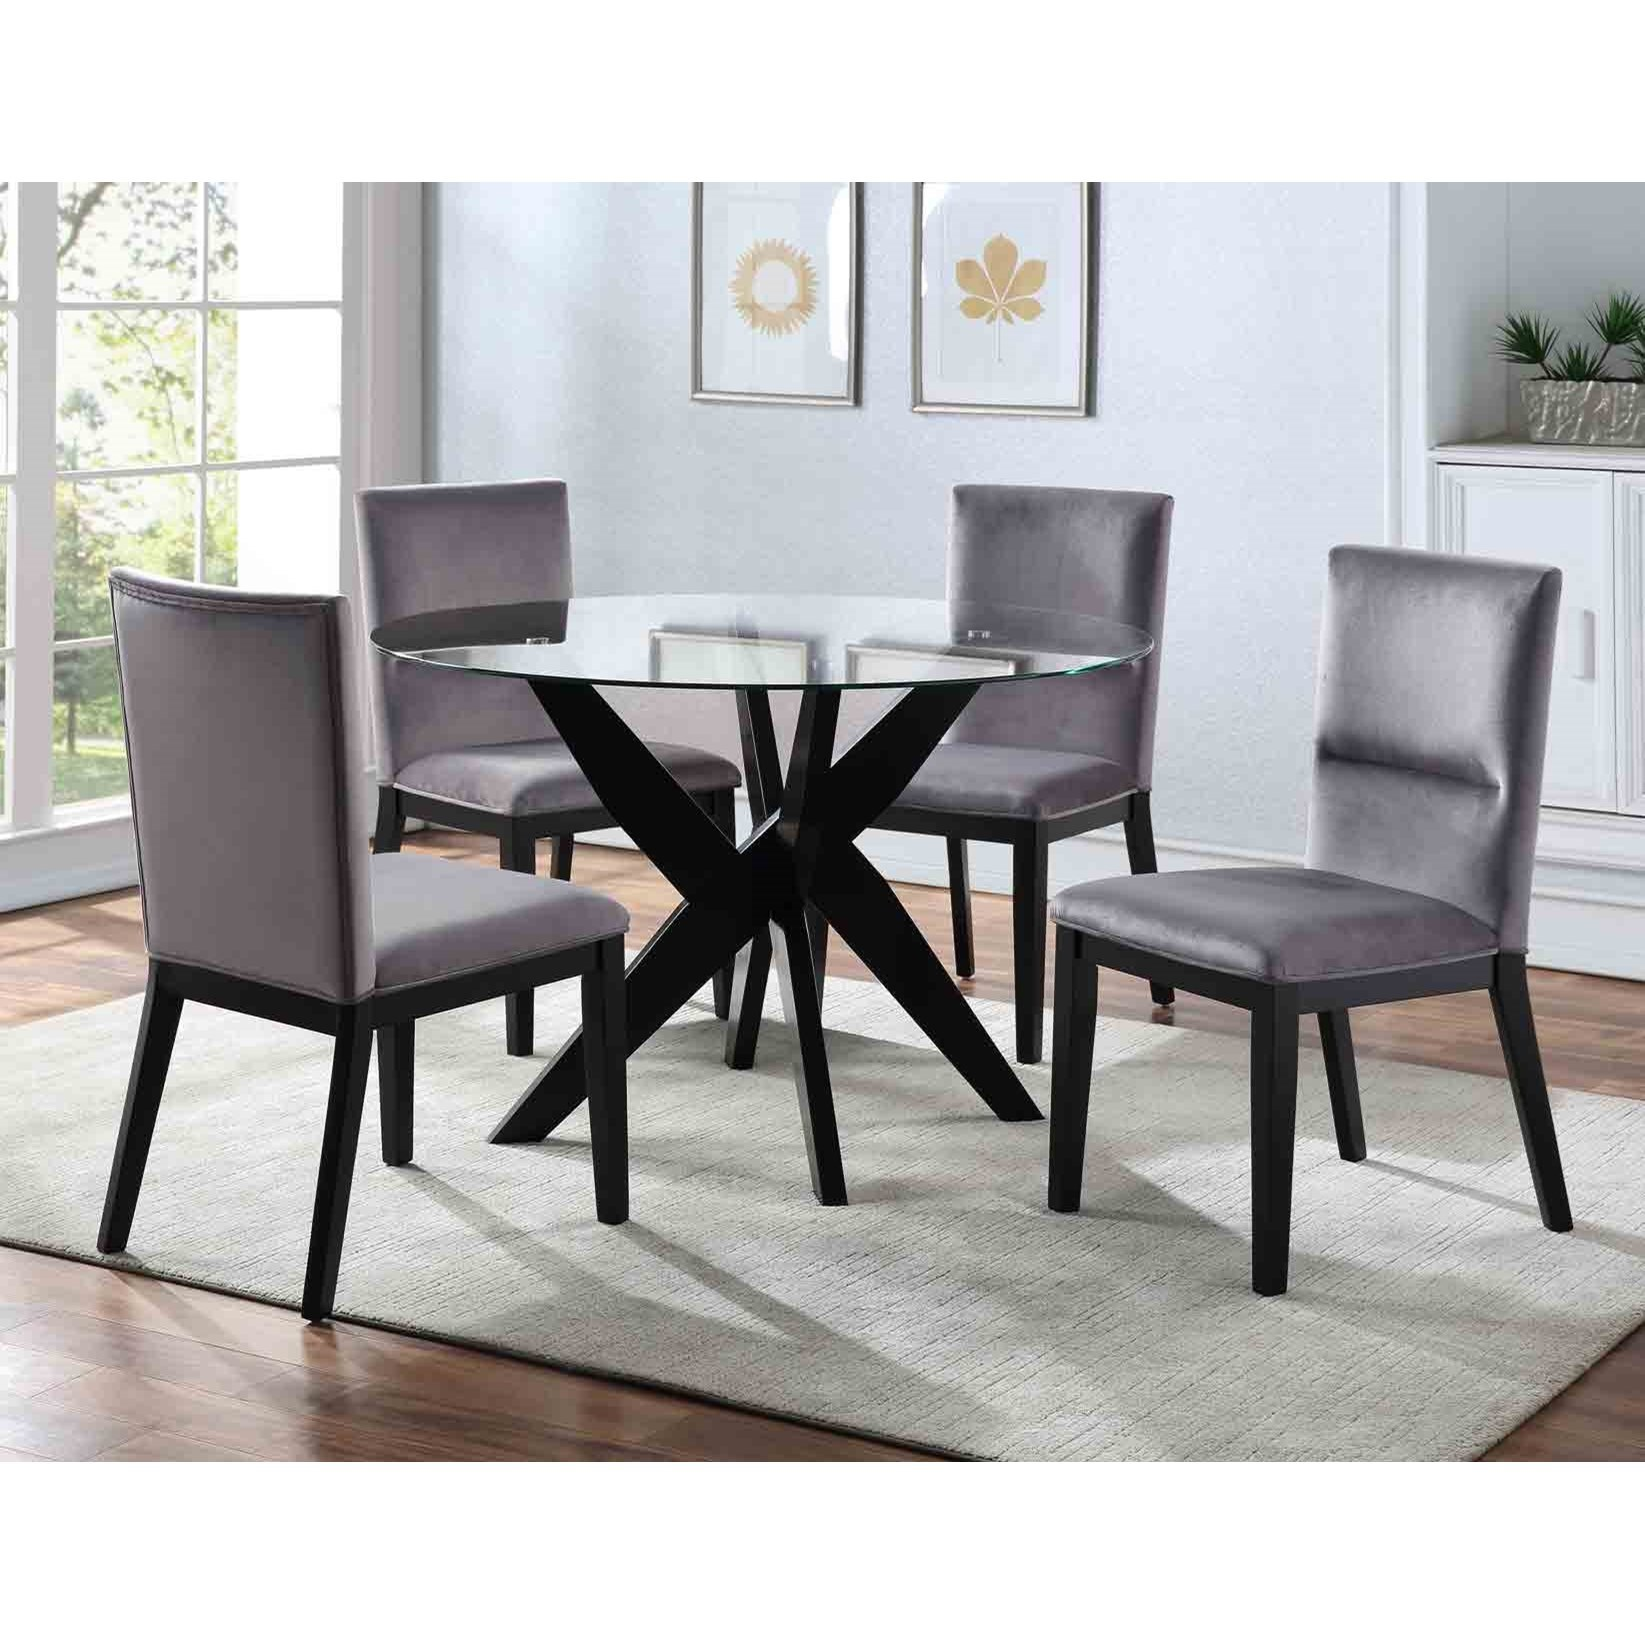 Amalie 5-Piece Dining Set  by Steve Silver at Standard Furniture